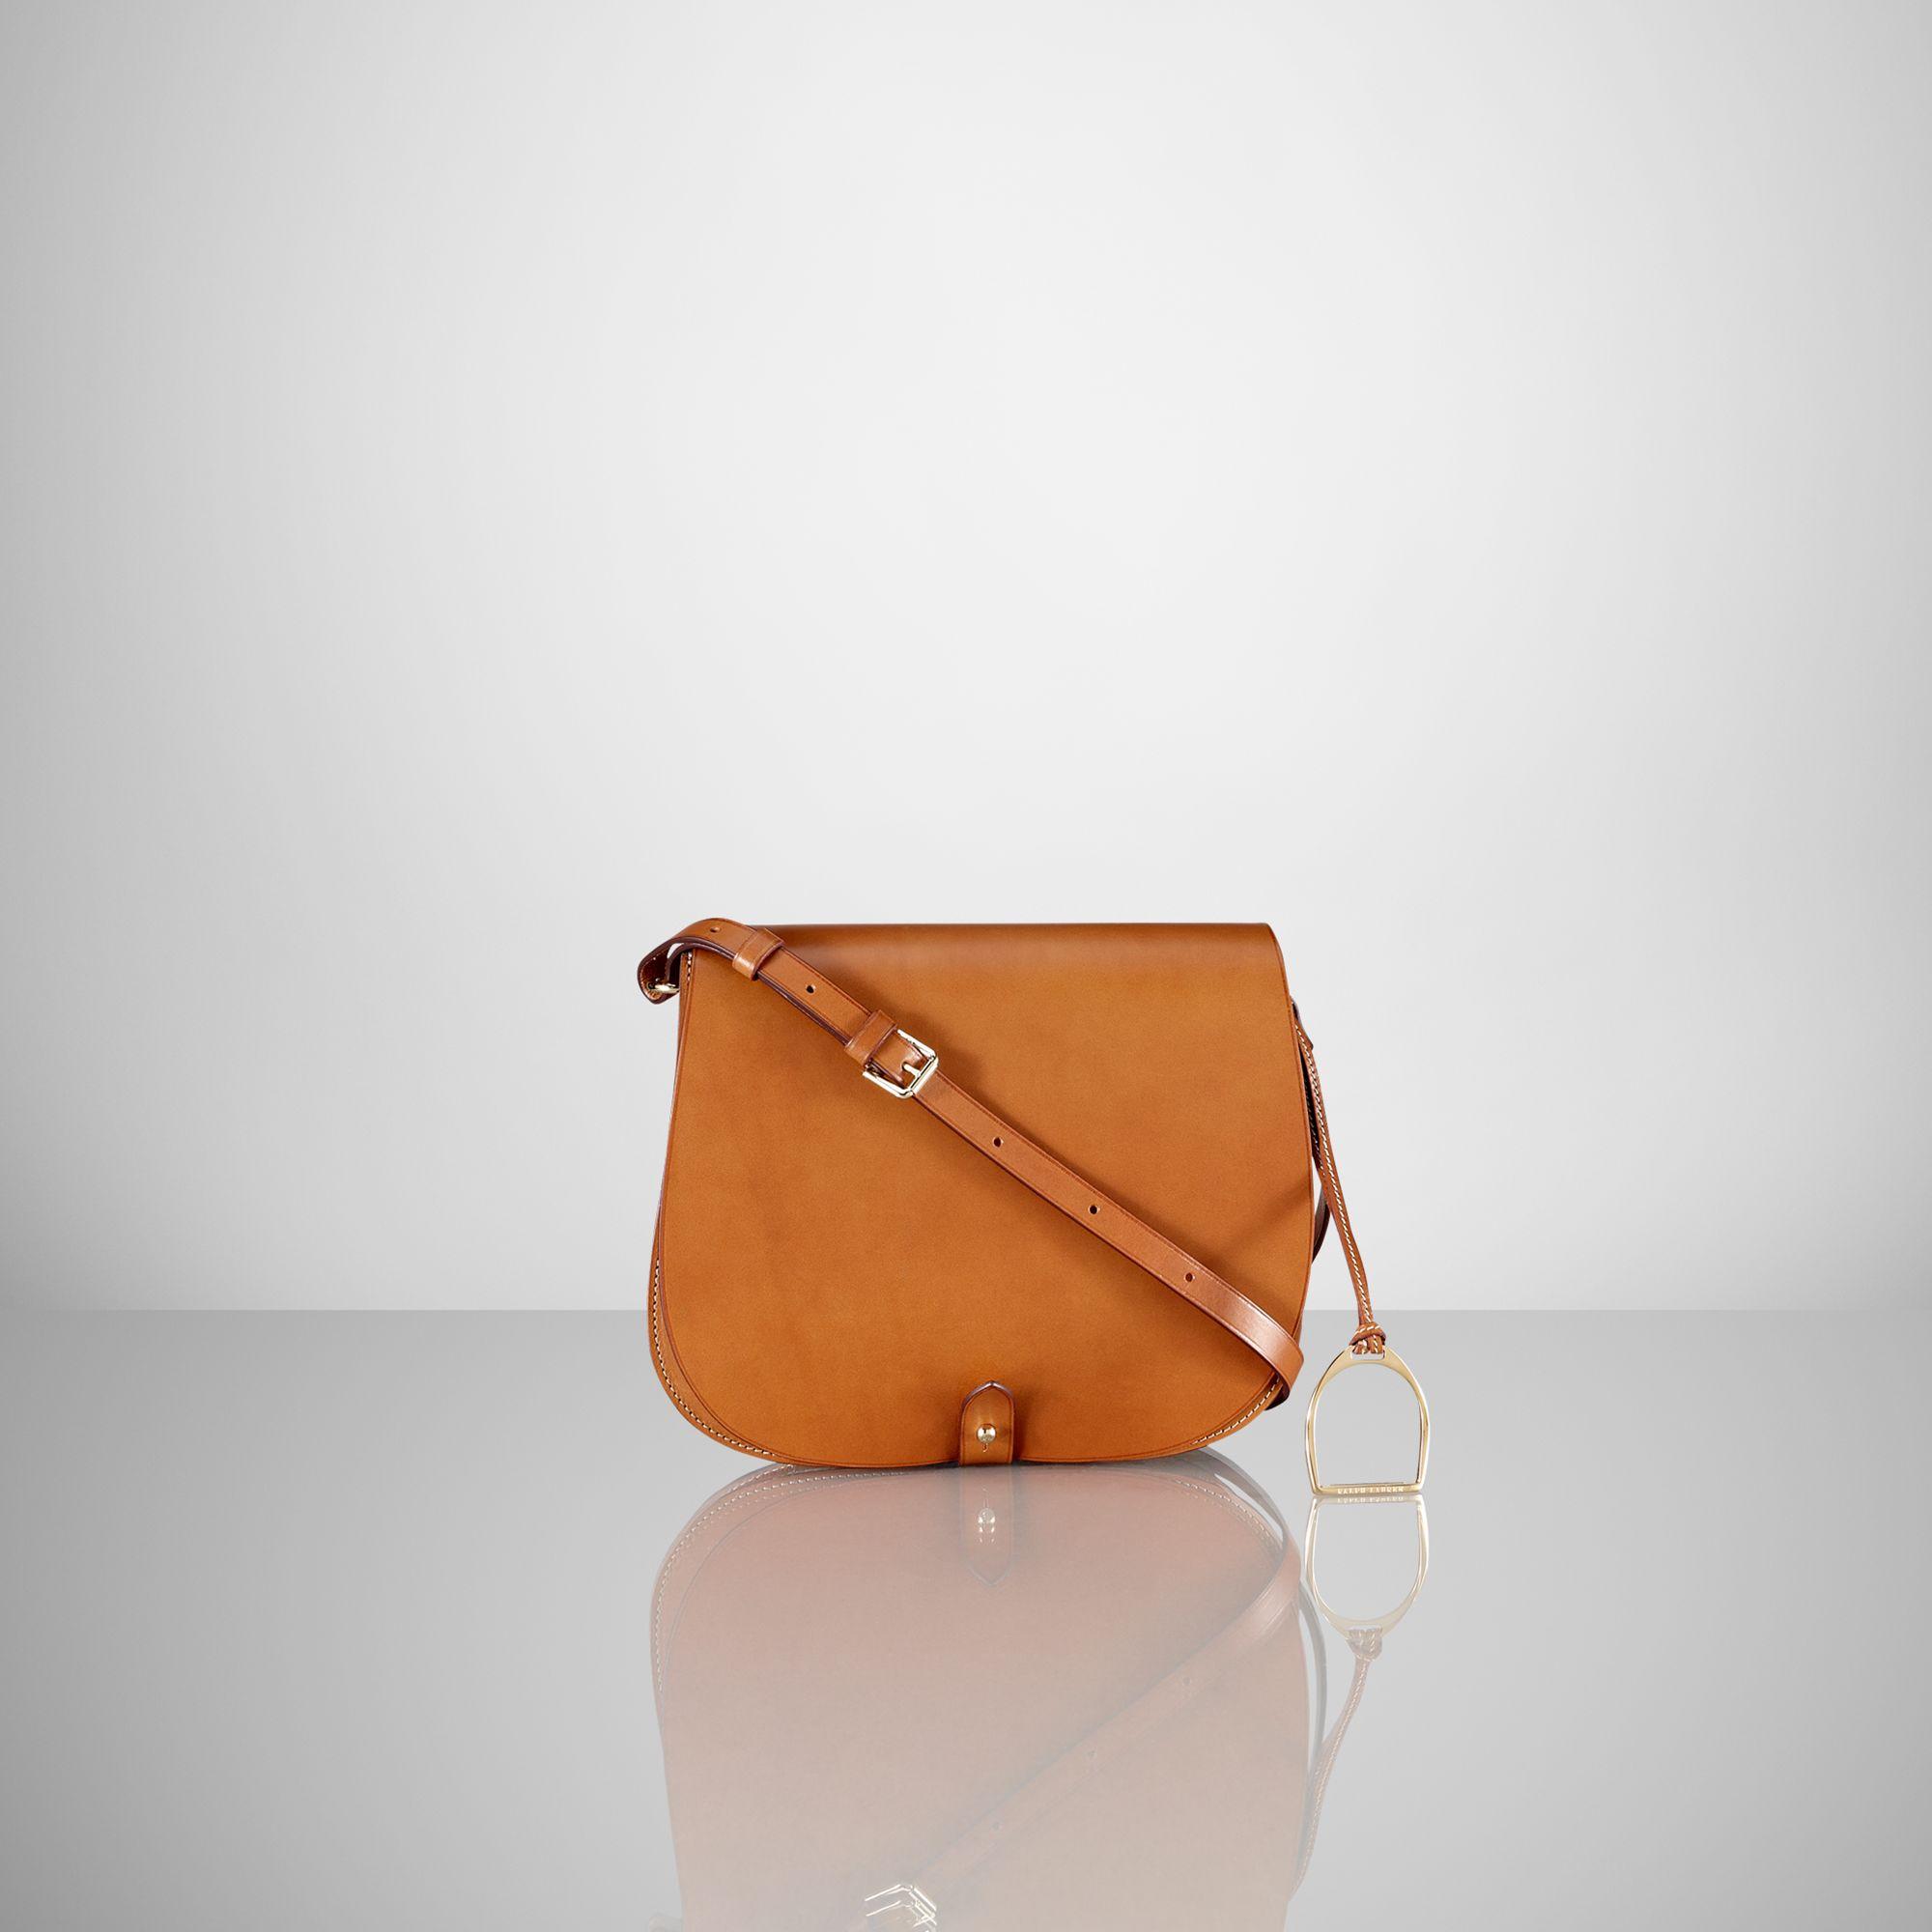 Ralph Lauren Equestrian Vachetta Saddle Bag in Orange - Lyst 30f4d99ed4